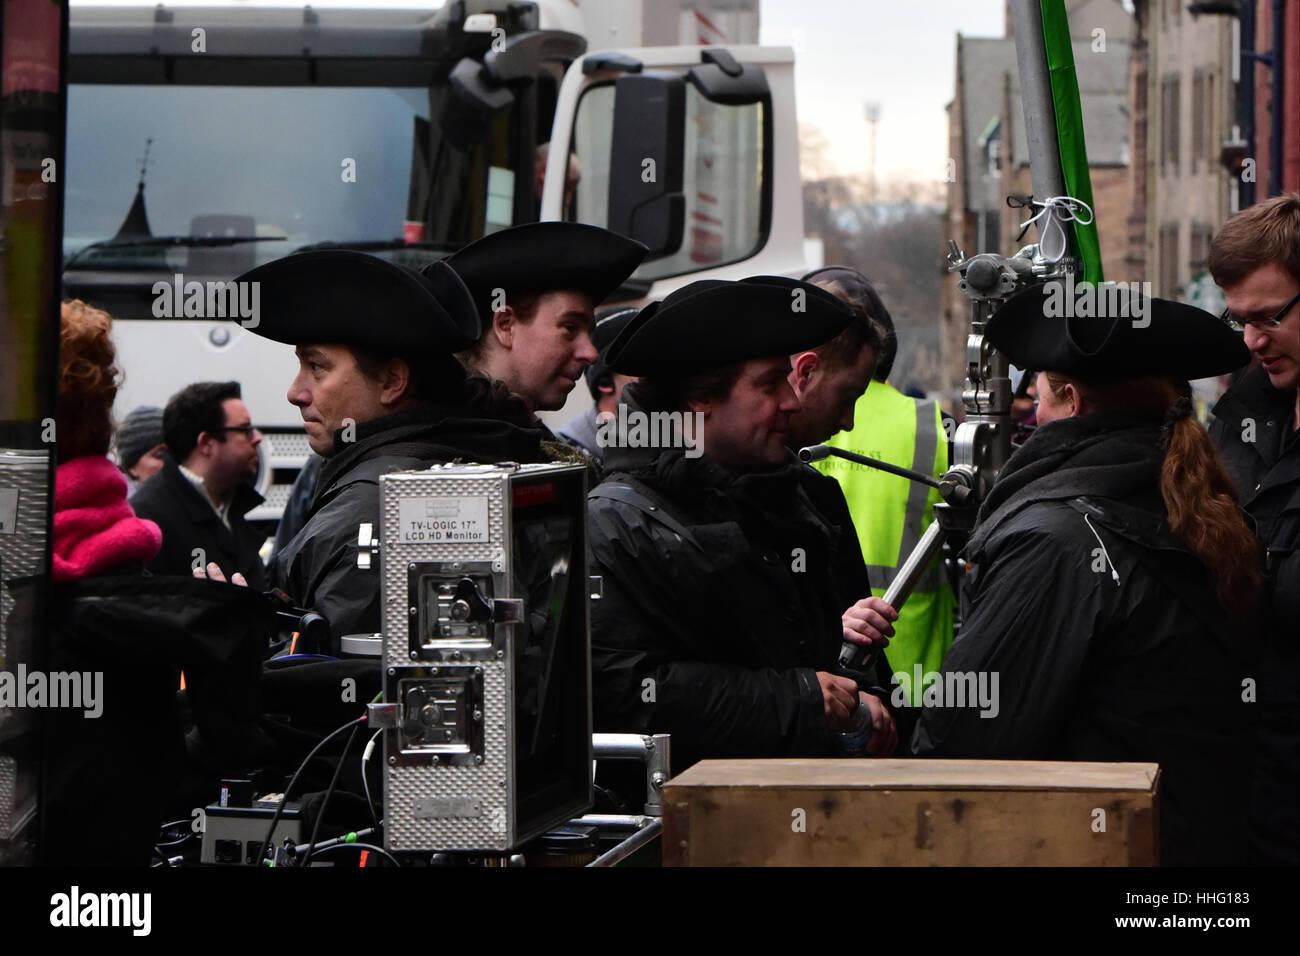 Edinburgh, Scotland, UK. 19th Jan, 2017.  Cast of the 'Outlander' TV series on location in Edinburgh's - Stock Image